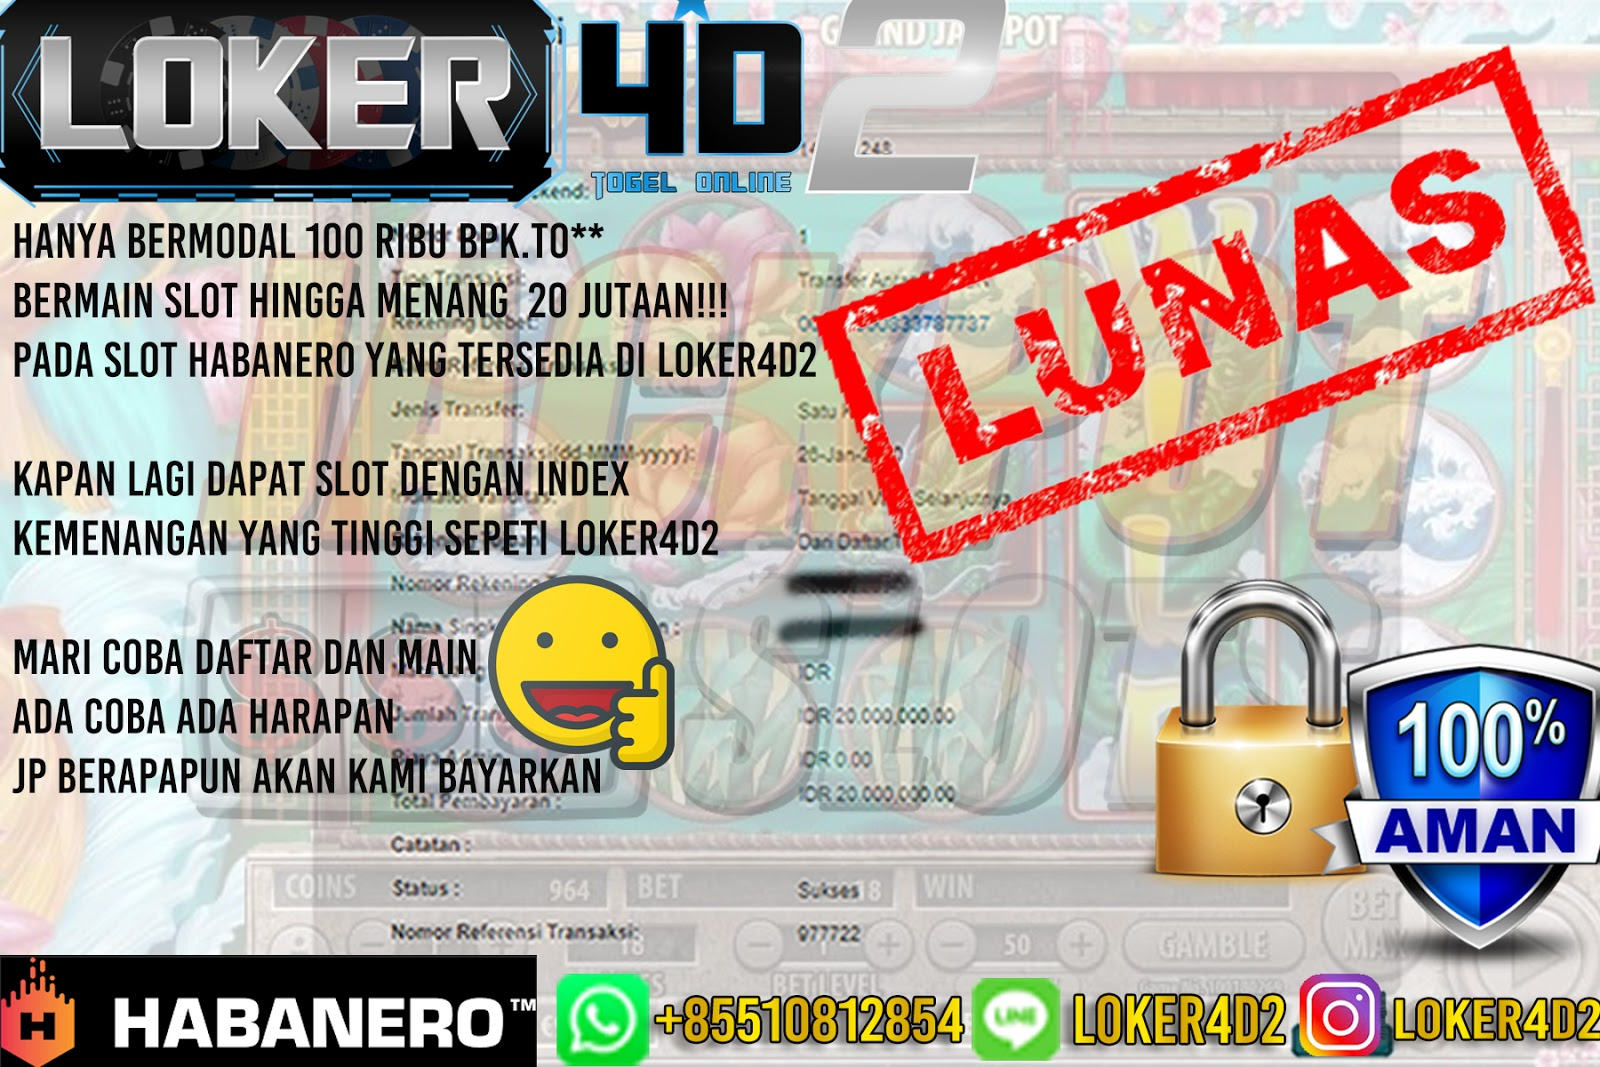 Selamat Atas Kemenangan Bpk.To** Yang Memainkan SLOT Game HABANERO DI LOKER4D2 Sebesar 20 JUTA!!!